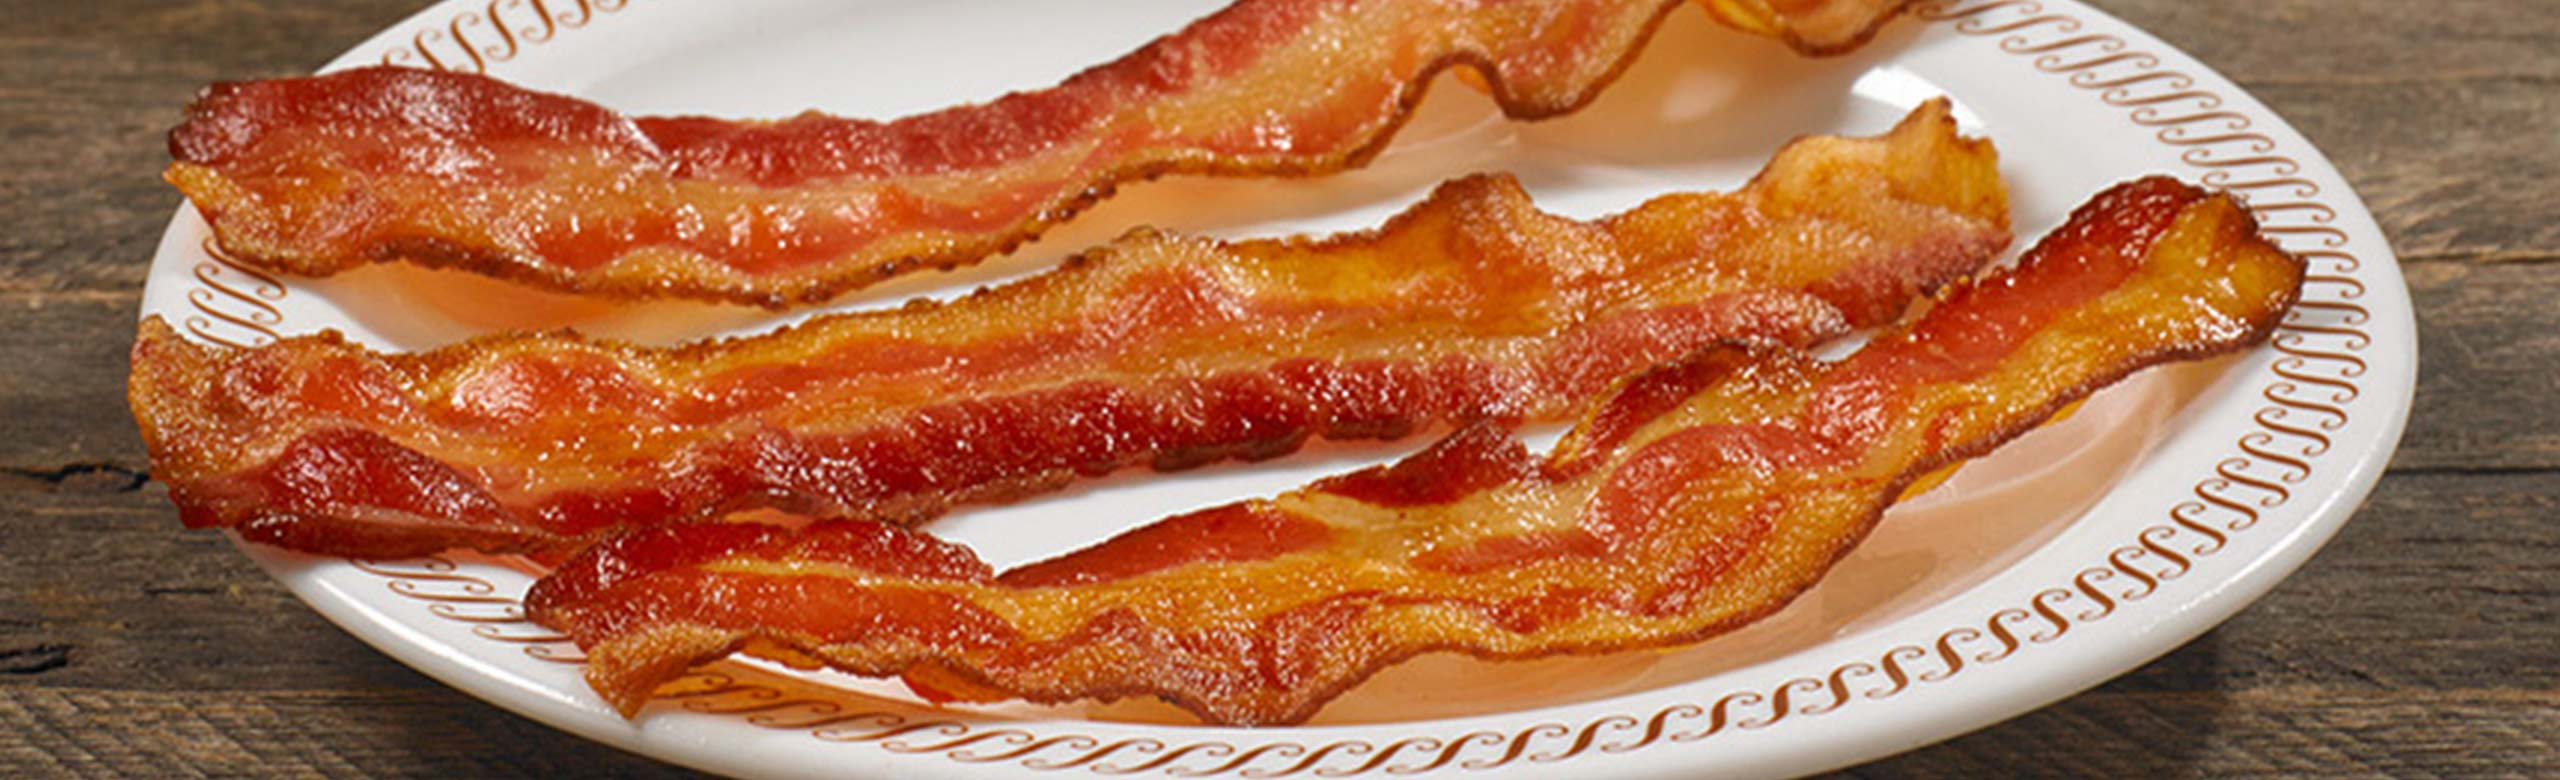 Waffle House Bacon